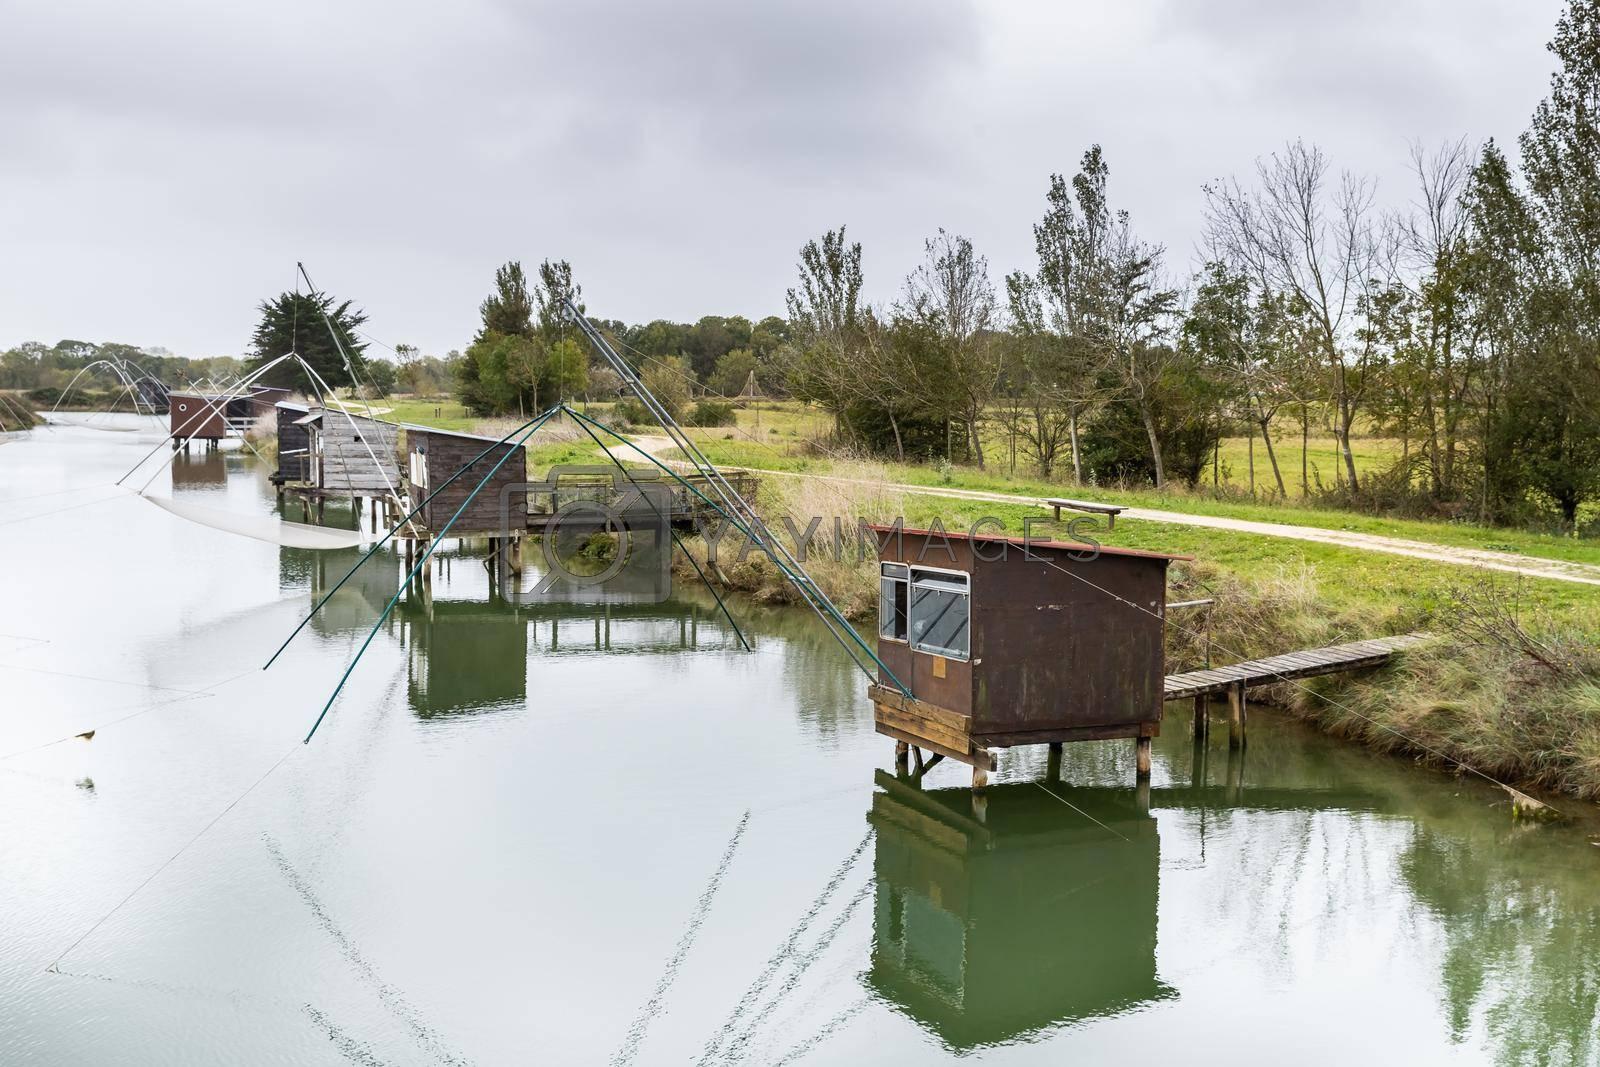 Carrelet de Pêche, the emblematic fisherman's hut of the coastal landscapes of Vendee, Charente-Maritime, in the estuary of La Gironde, La Charente, La Loire or in the Marais Poitevin